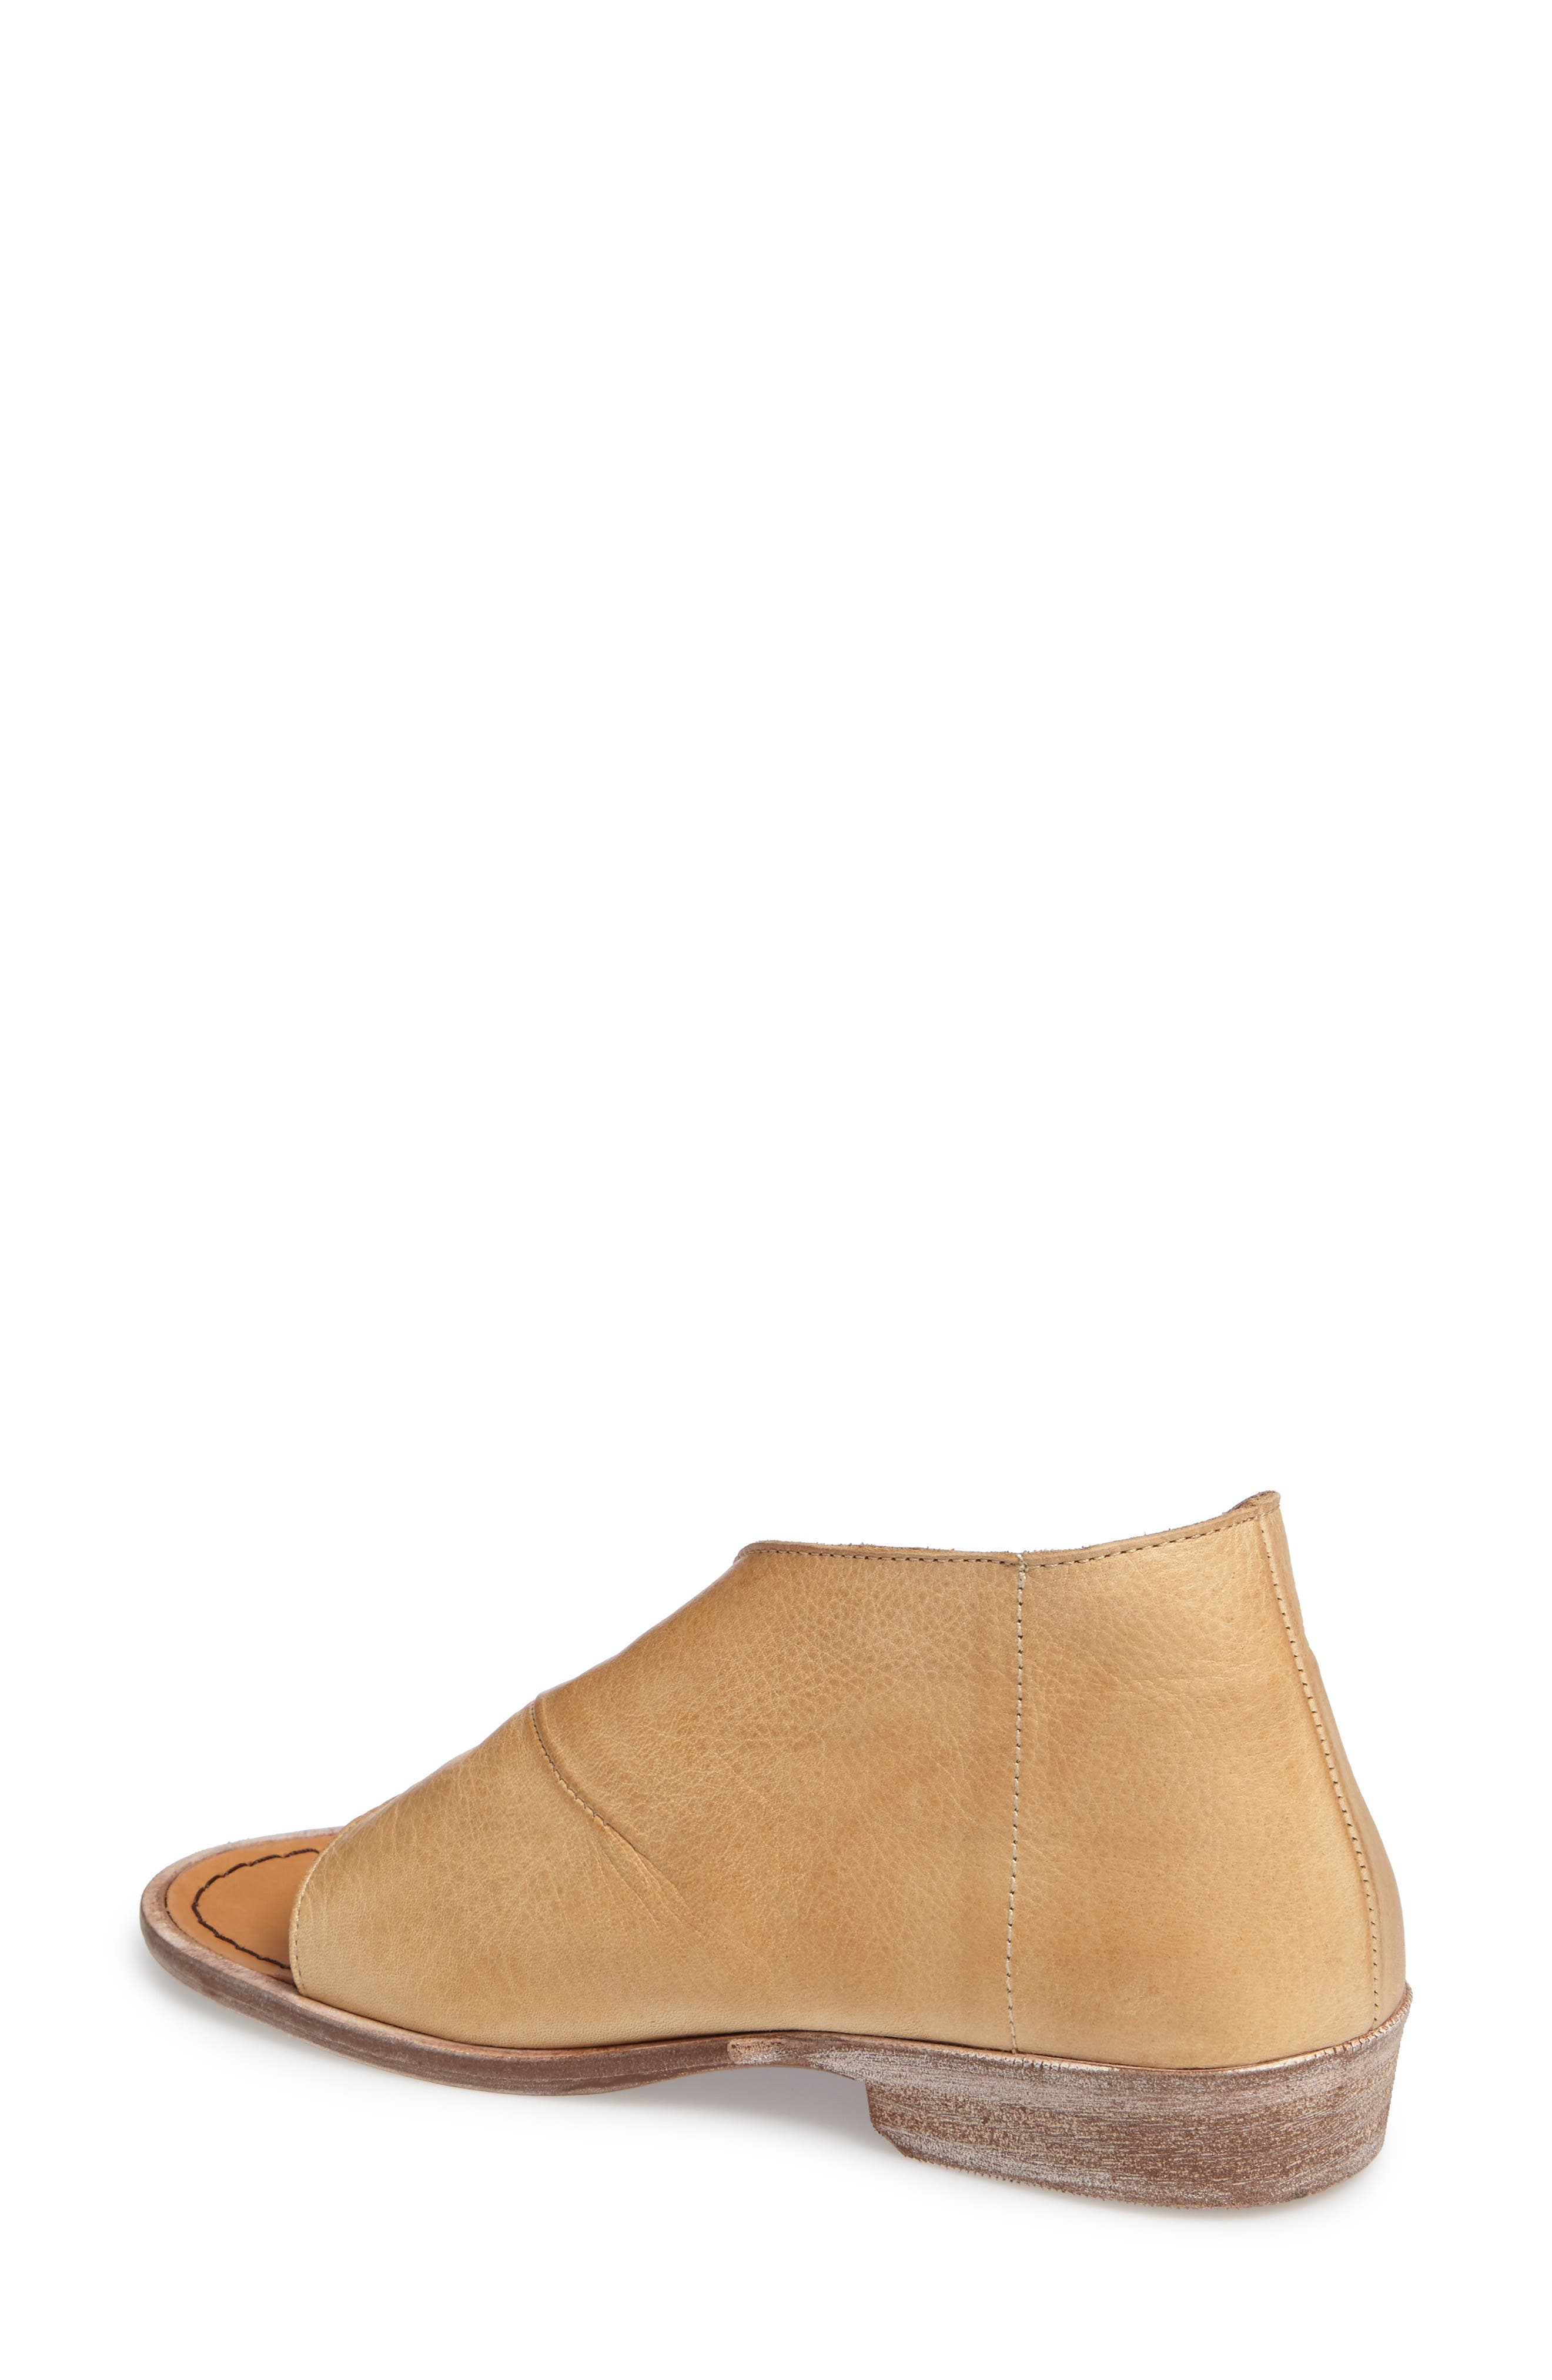 'Mont Blanc' Asymmetrical Sandal,                             Alternate thumbnail 26, color,